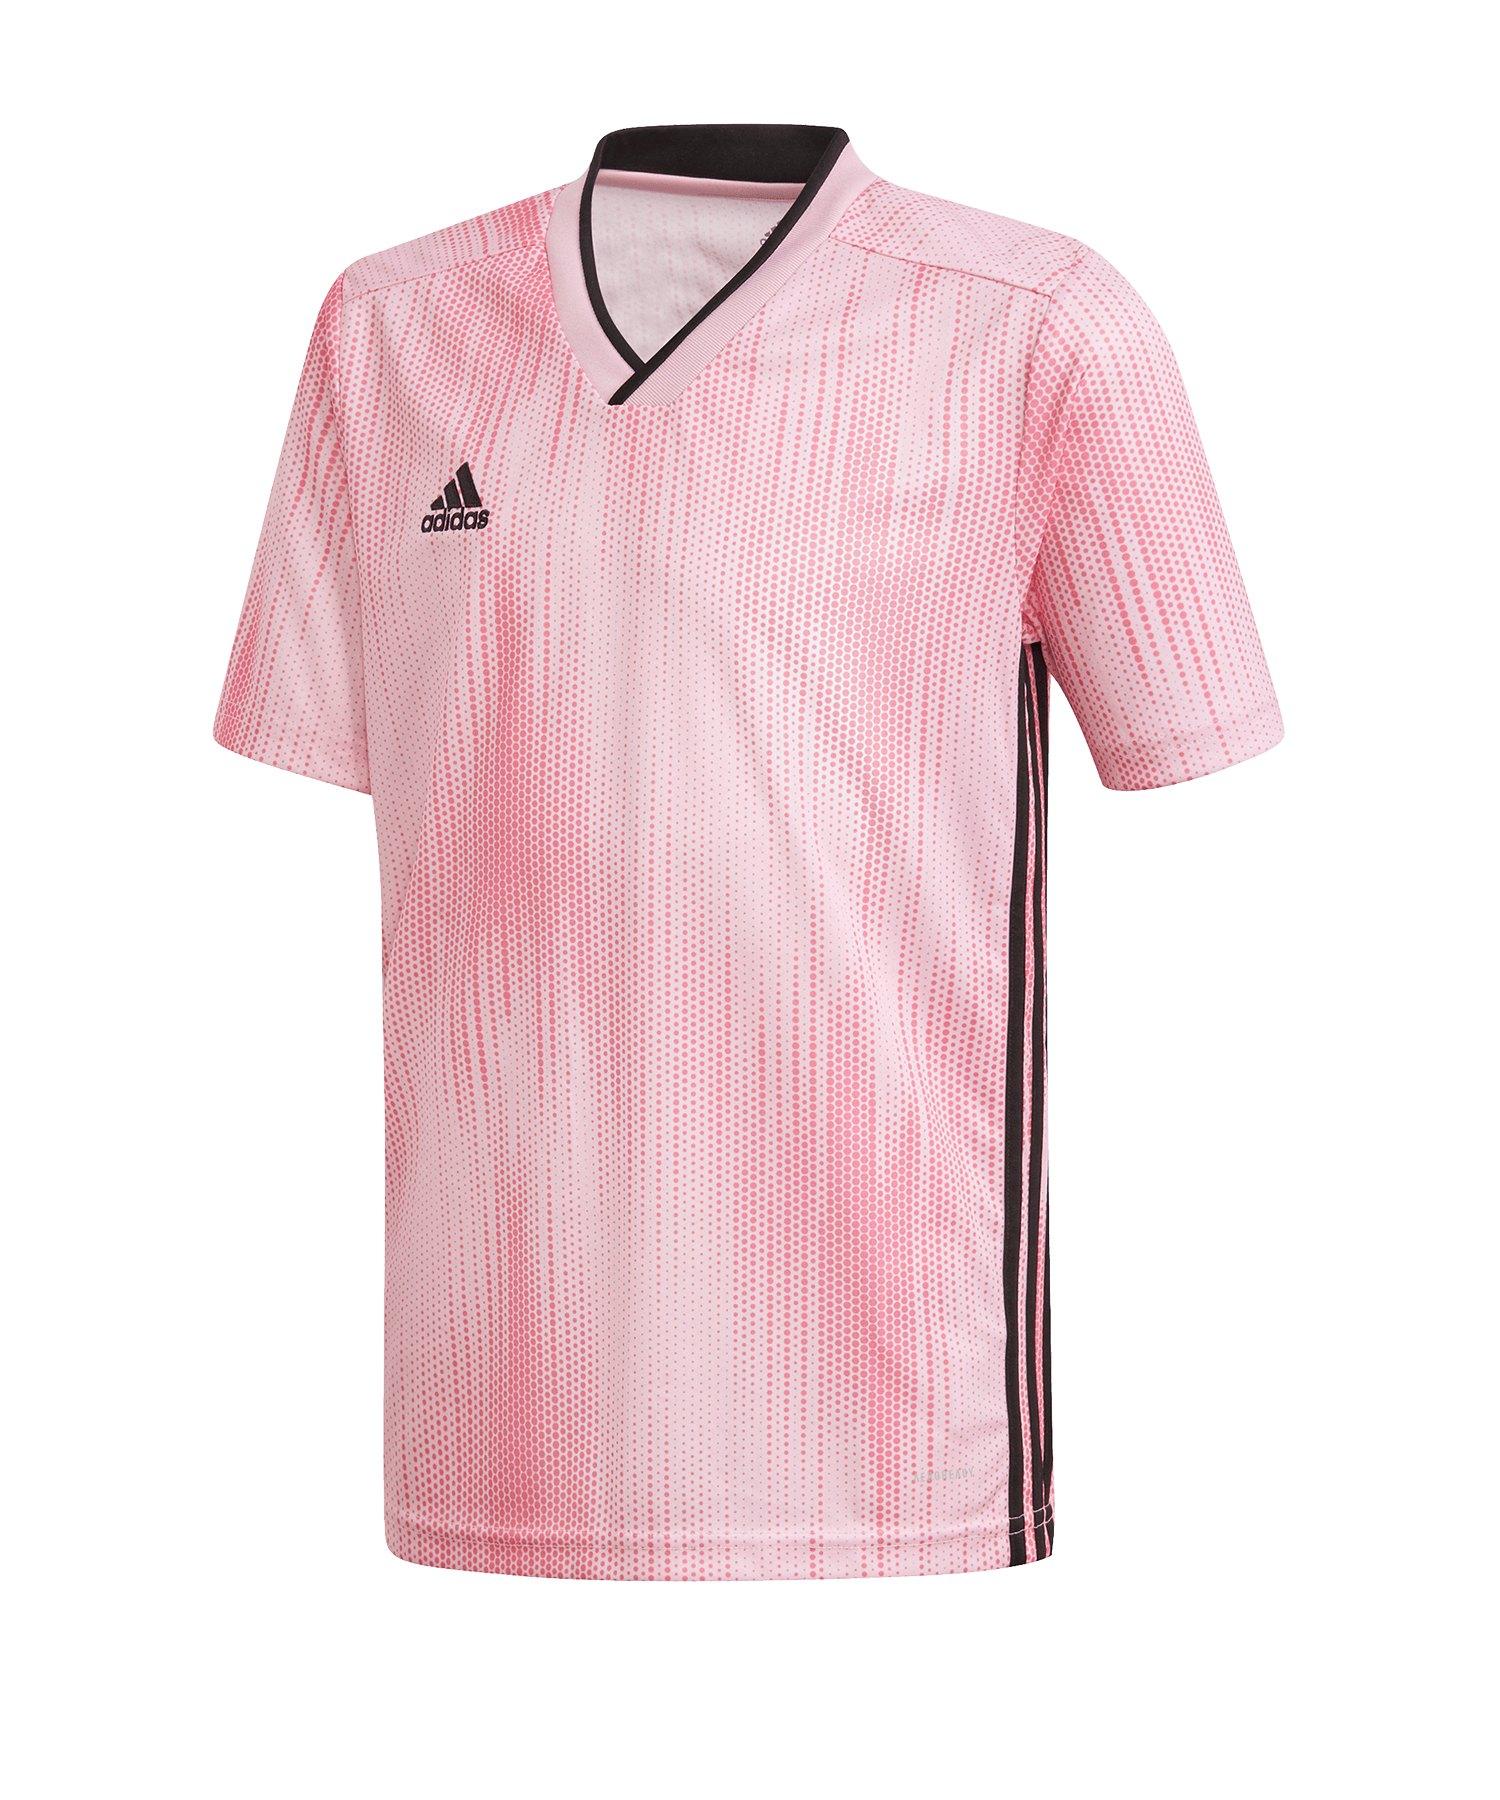 adidas Tiro 19 Trikot kurzarm Kids Pink Schwarz - pink